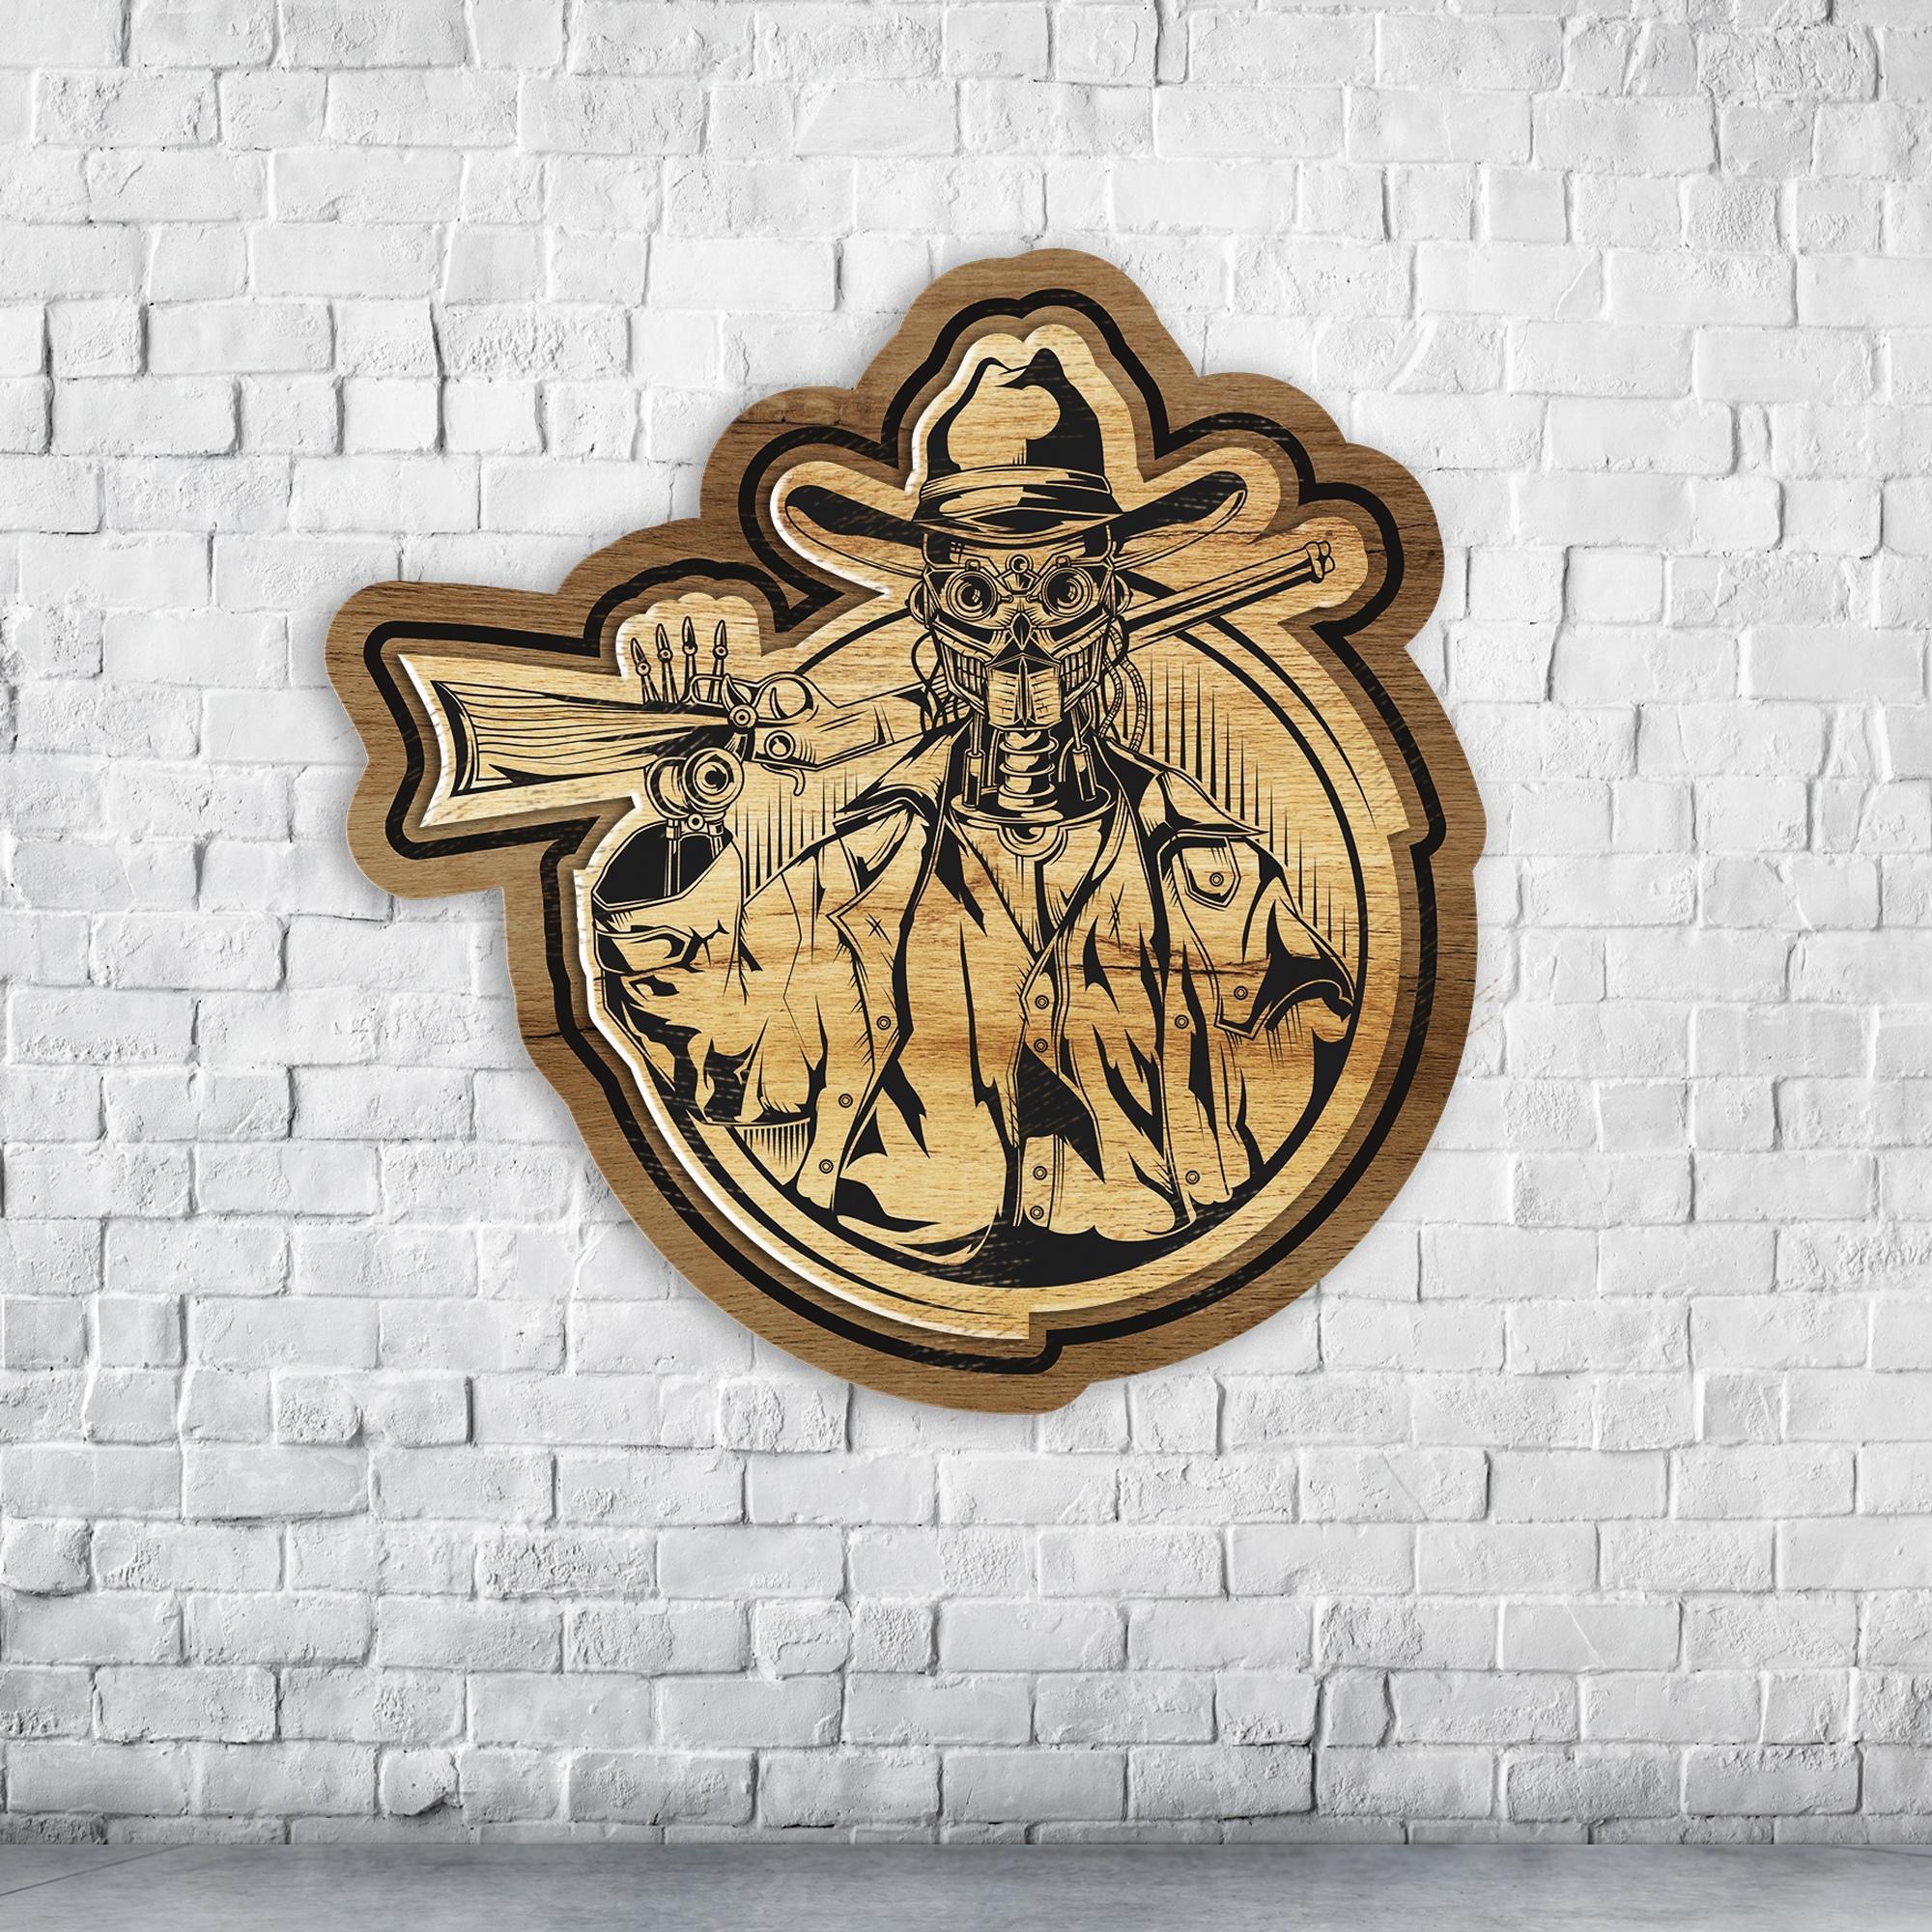 Laser Cut Engraved Robot Cowboy Badge Coaster Wall Decor Free Vector